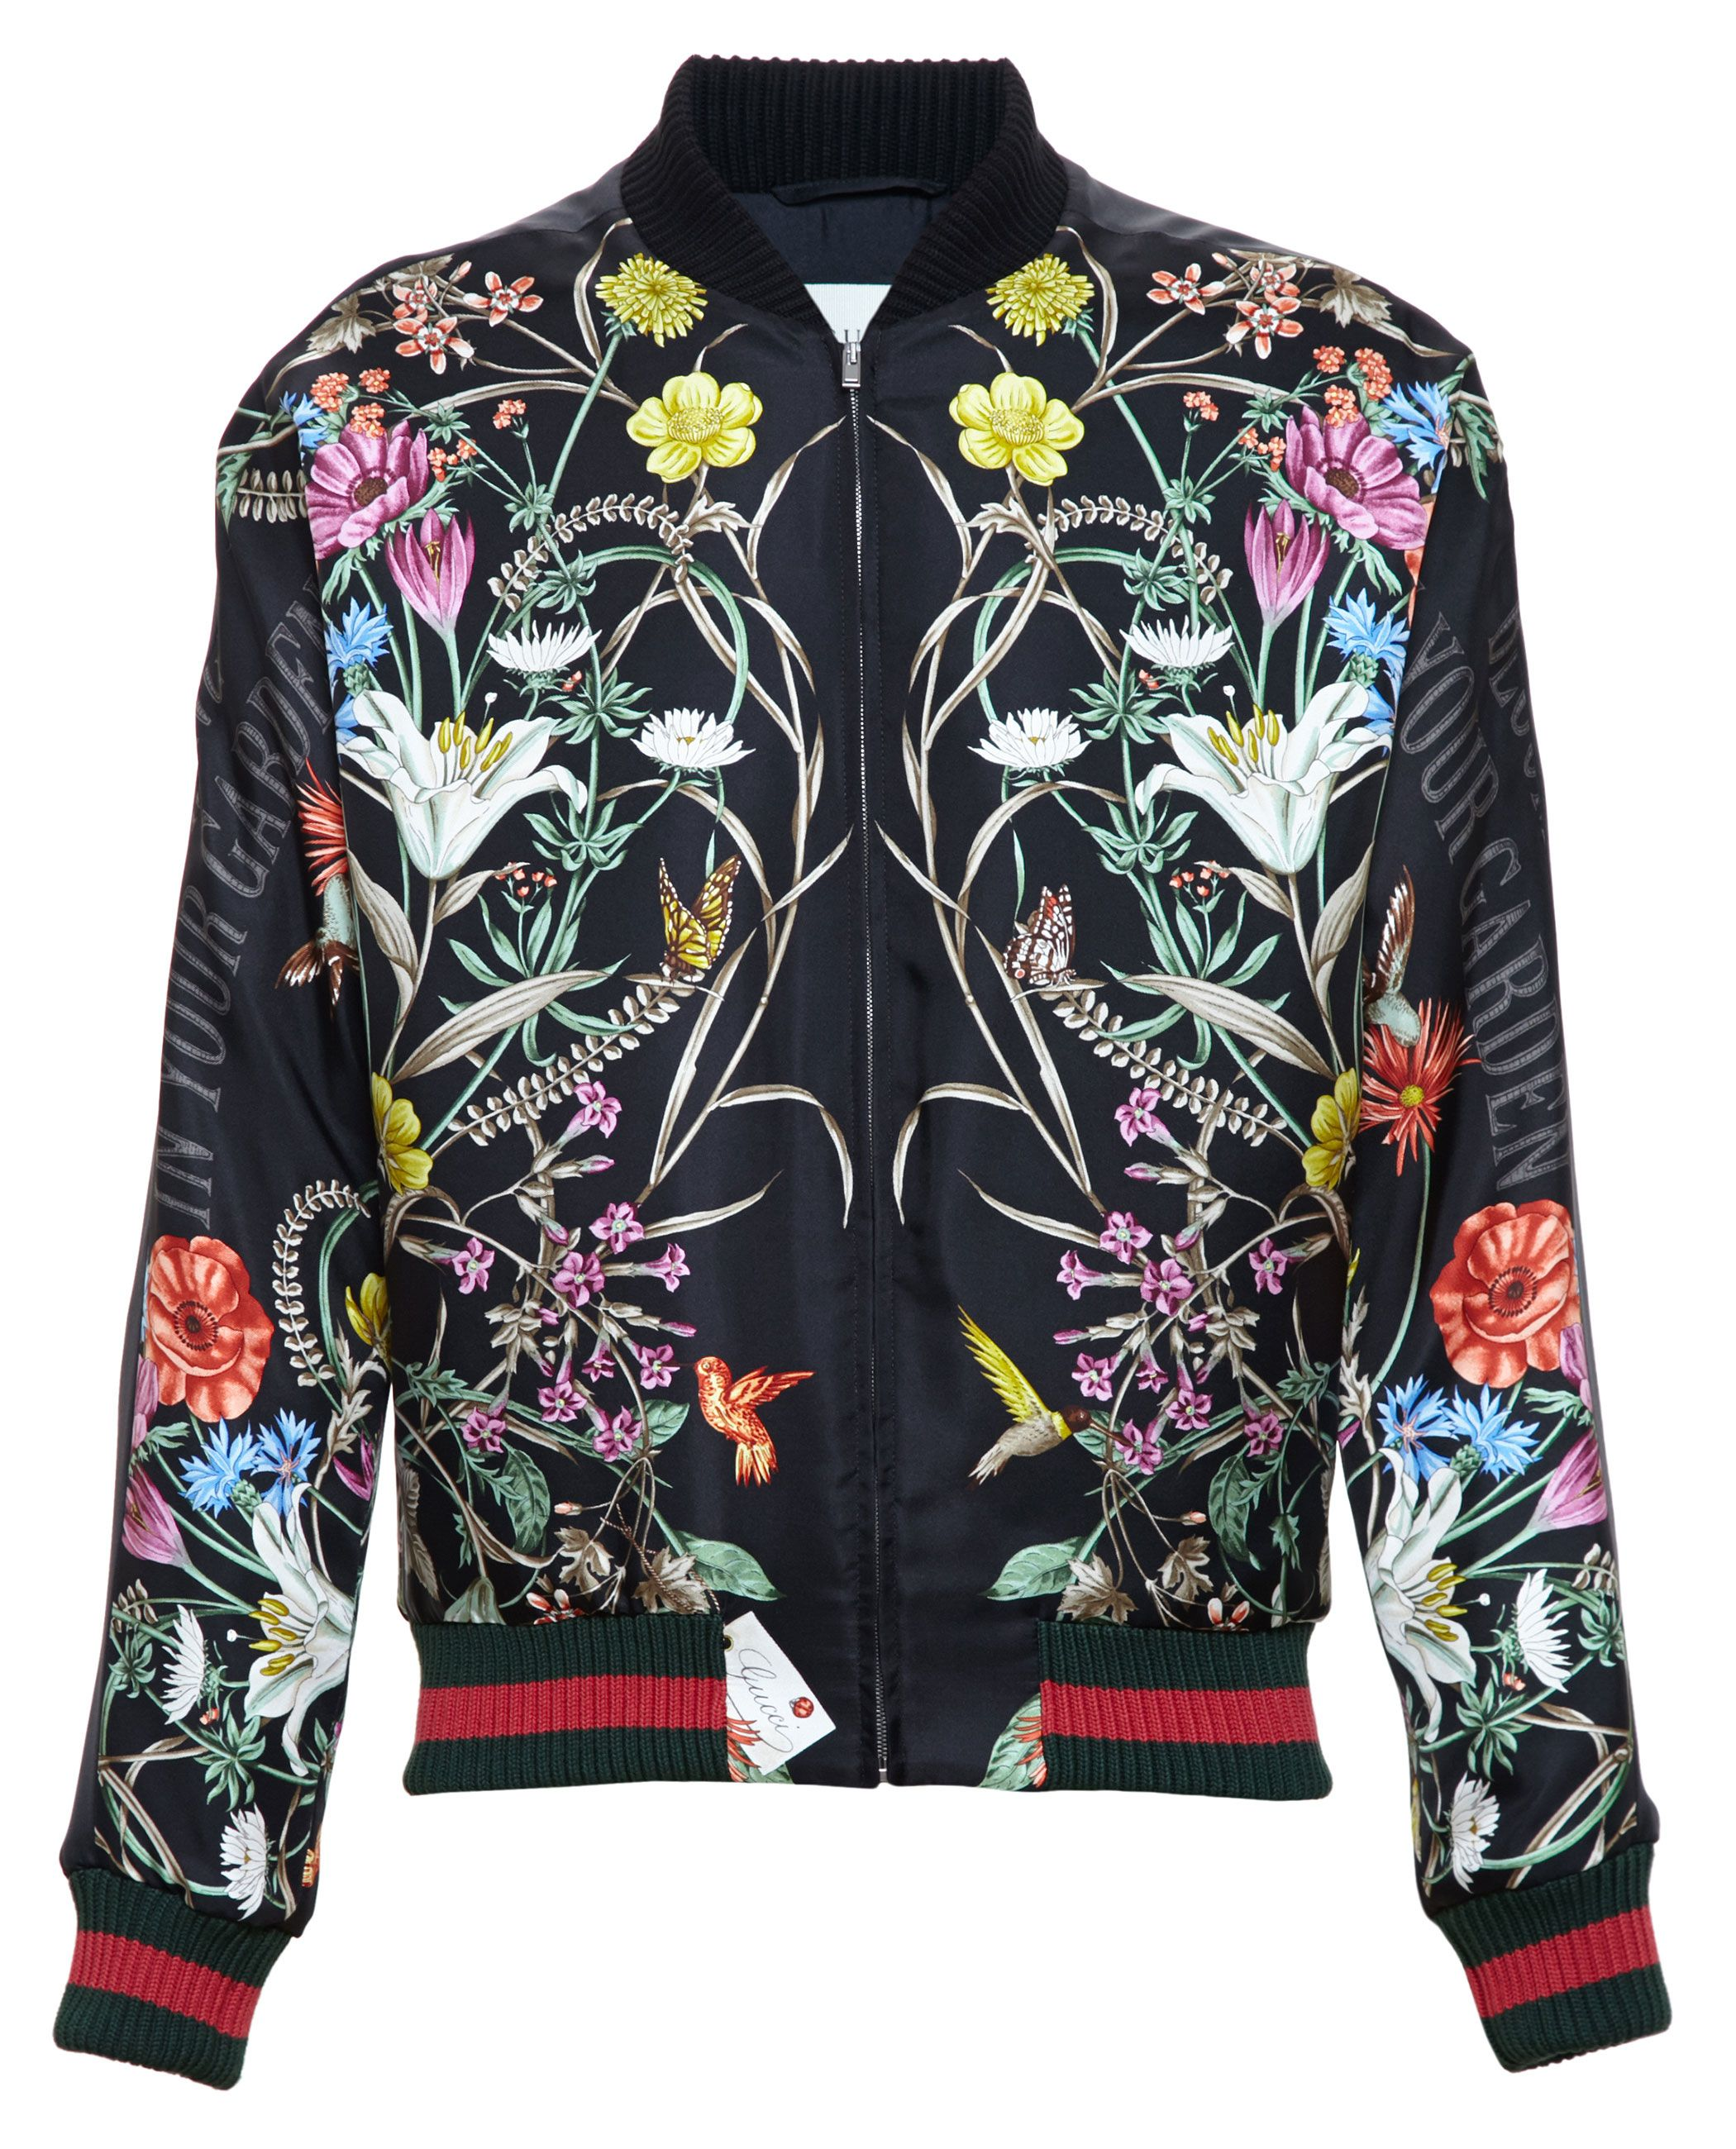 Women's Black Floral-print Embroidered Silk Bomber Jacket | Silk ...